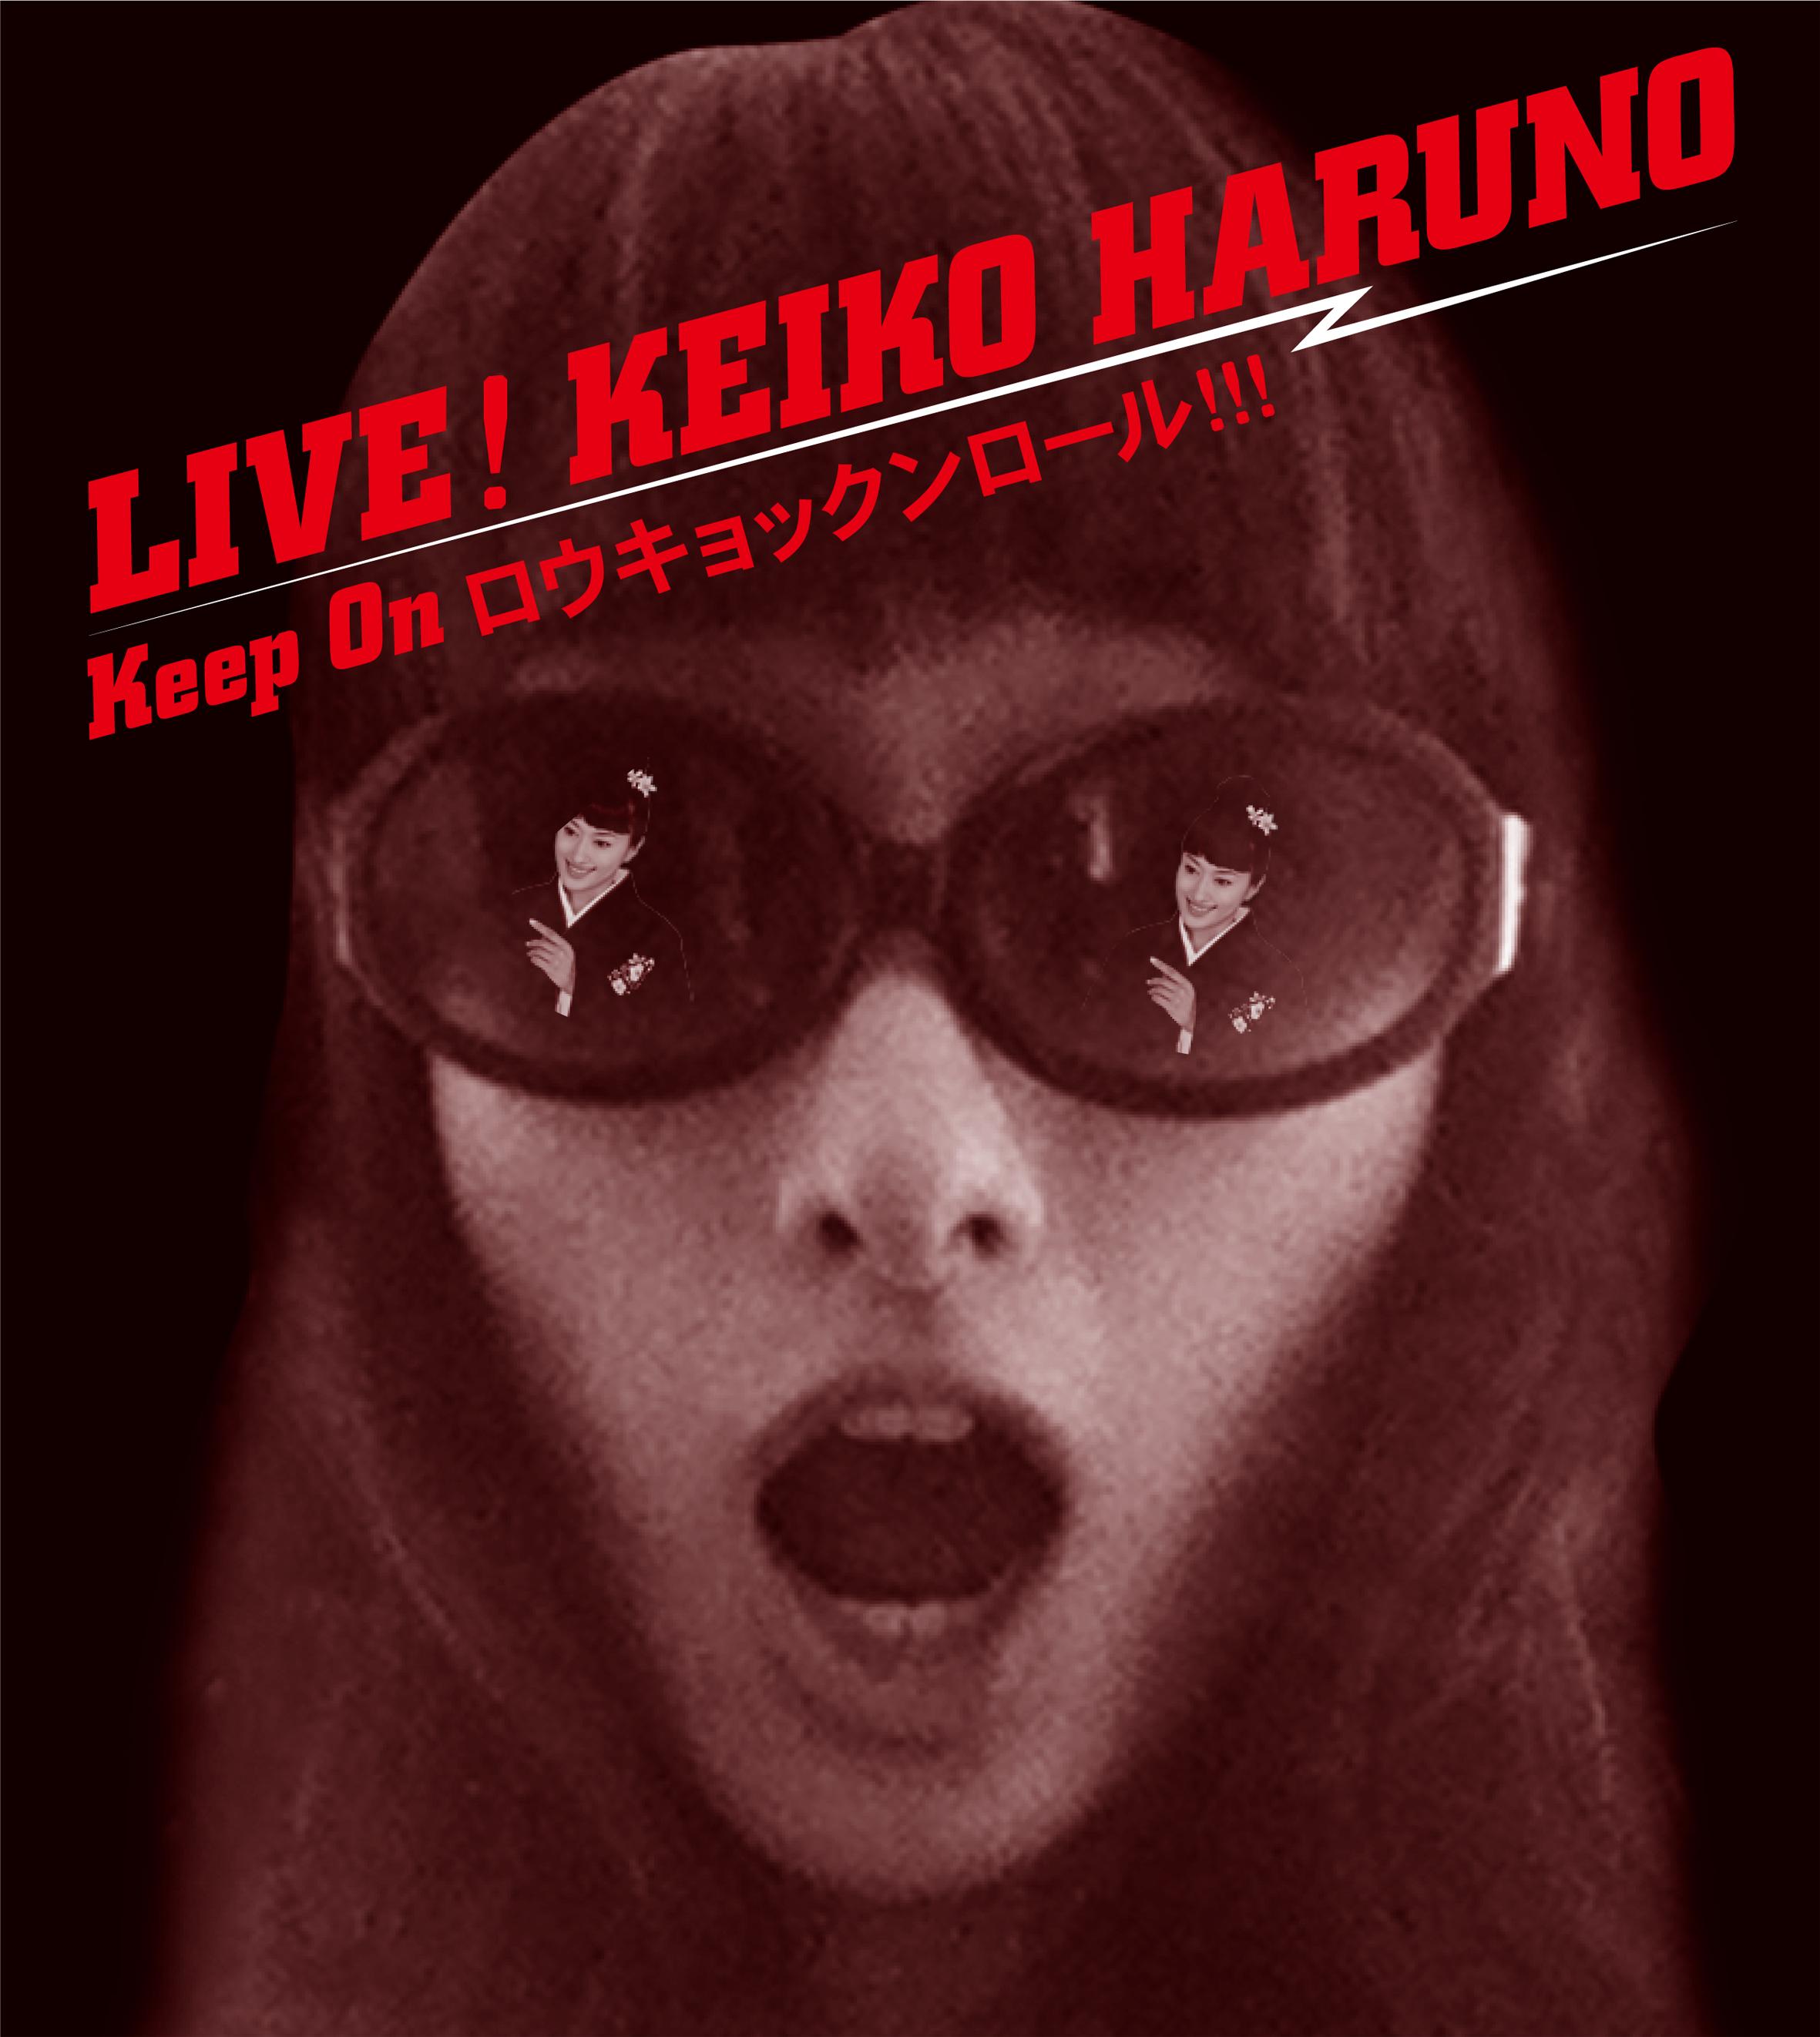 """LIVE!KEIKO HARUNO Keep On ロウキョックンロール!!!"""